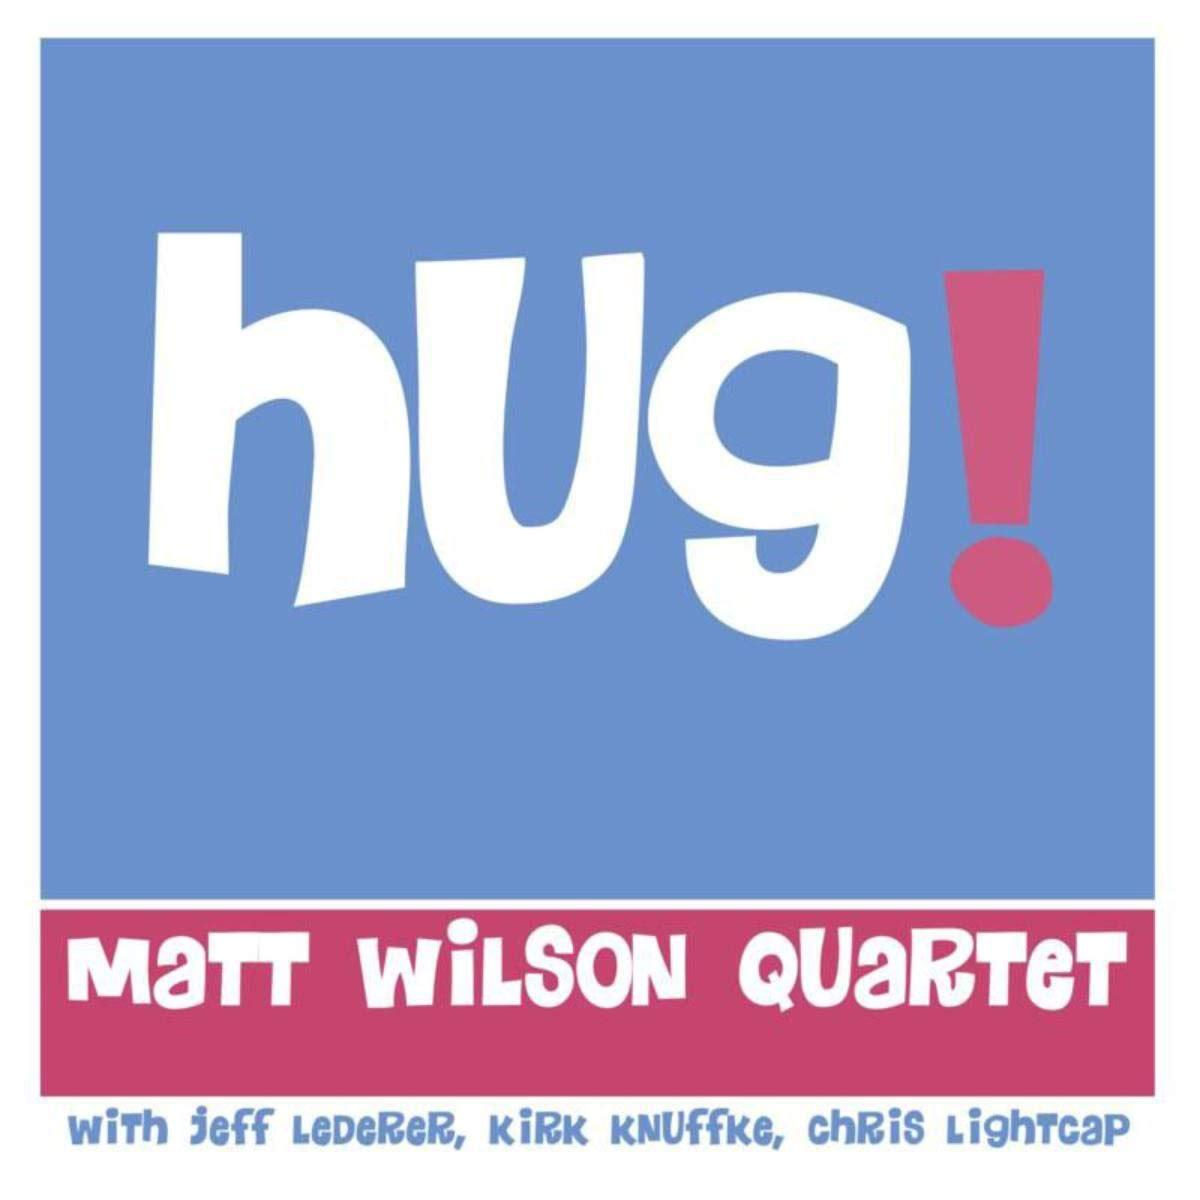 The Matt Wilson Quartet's Hug